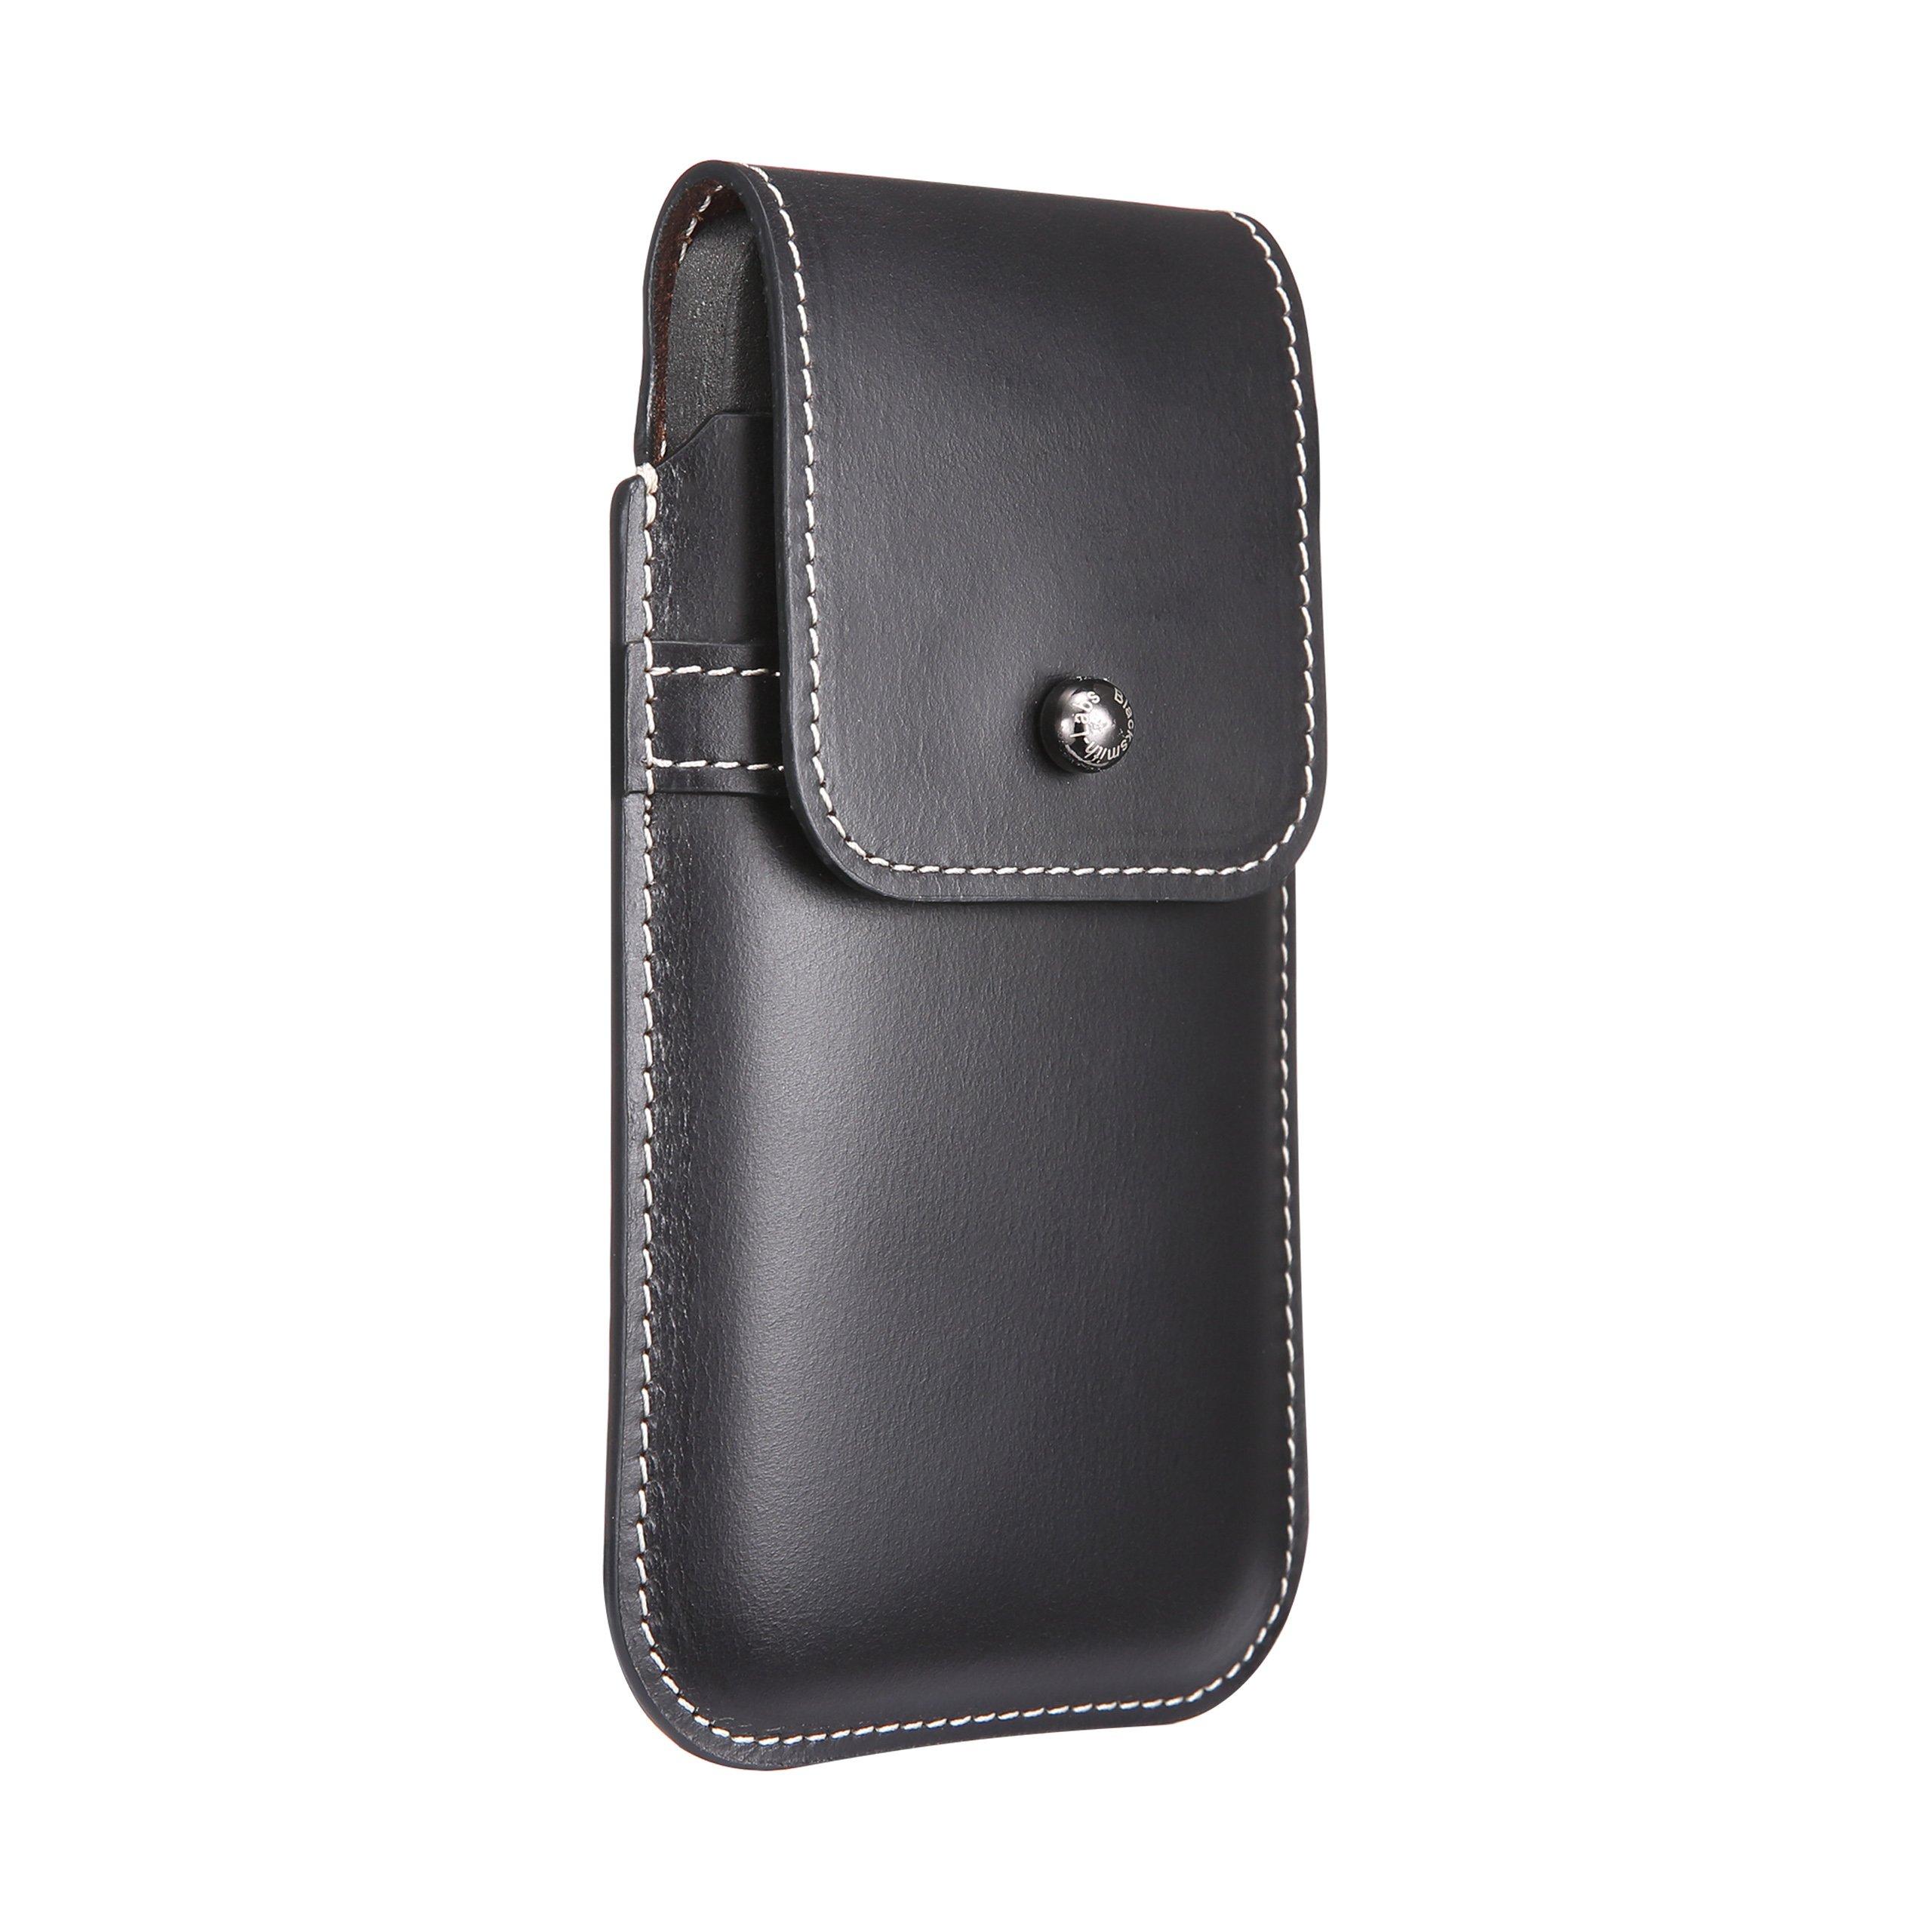 Blacksmith-Labs Barrett Mezzano 2017 Premium Oversized Genuine Leather Swivel Belt Clip Holster for Apple iPhone X/Xs for use w Apple Leather Case - Horween Chromexcel Lapis Blue, Gunmetal Belt Clip